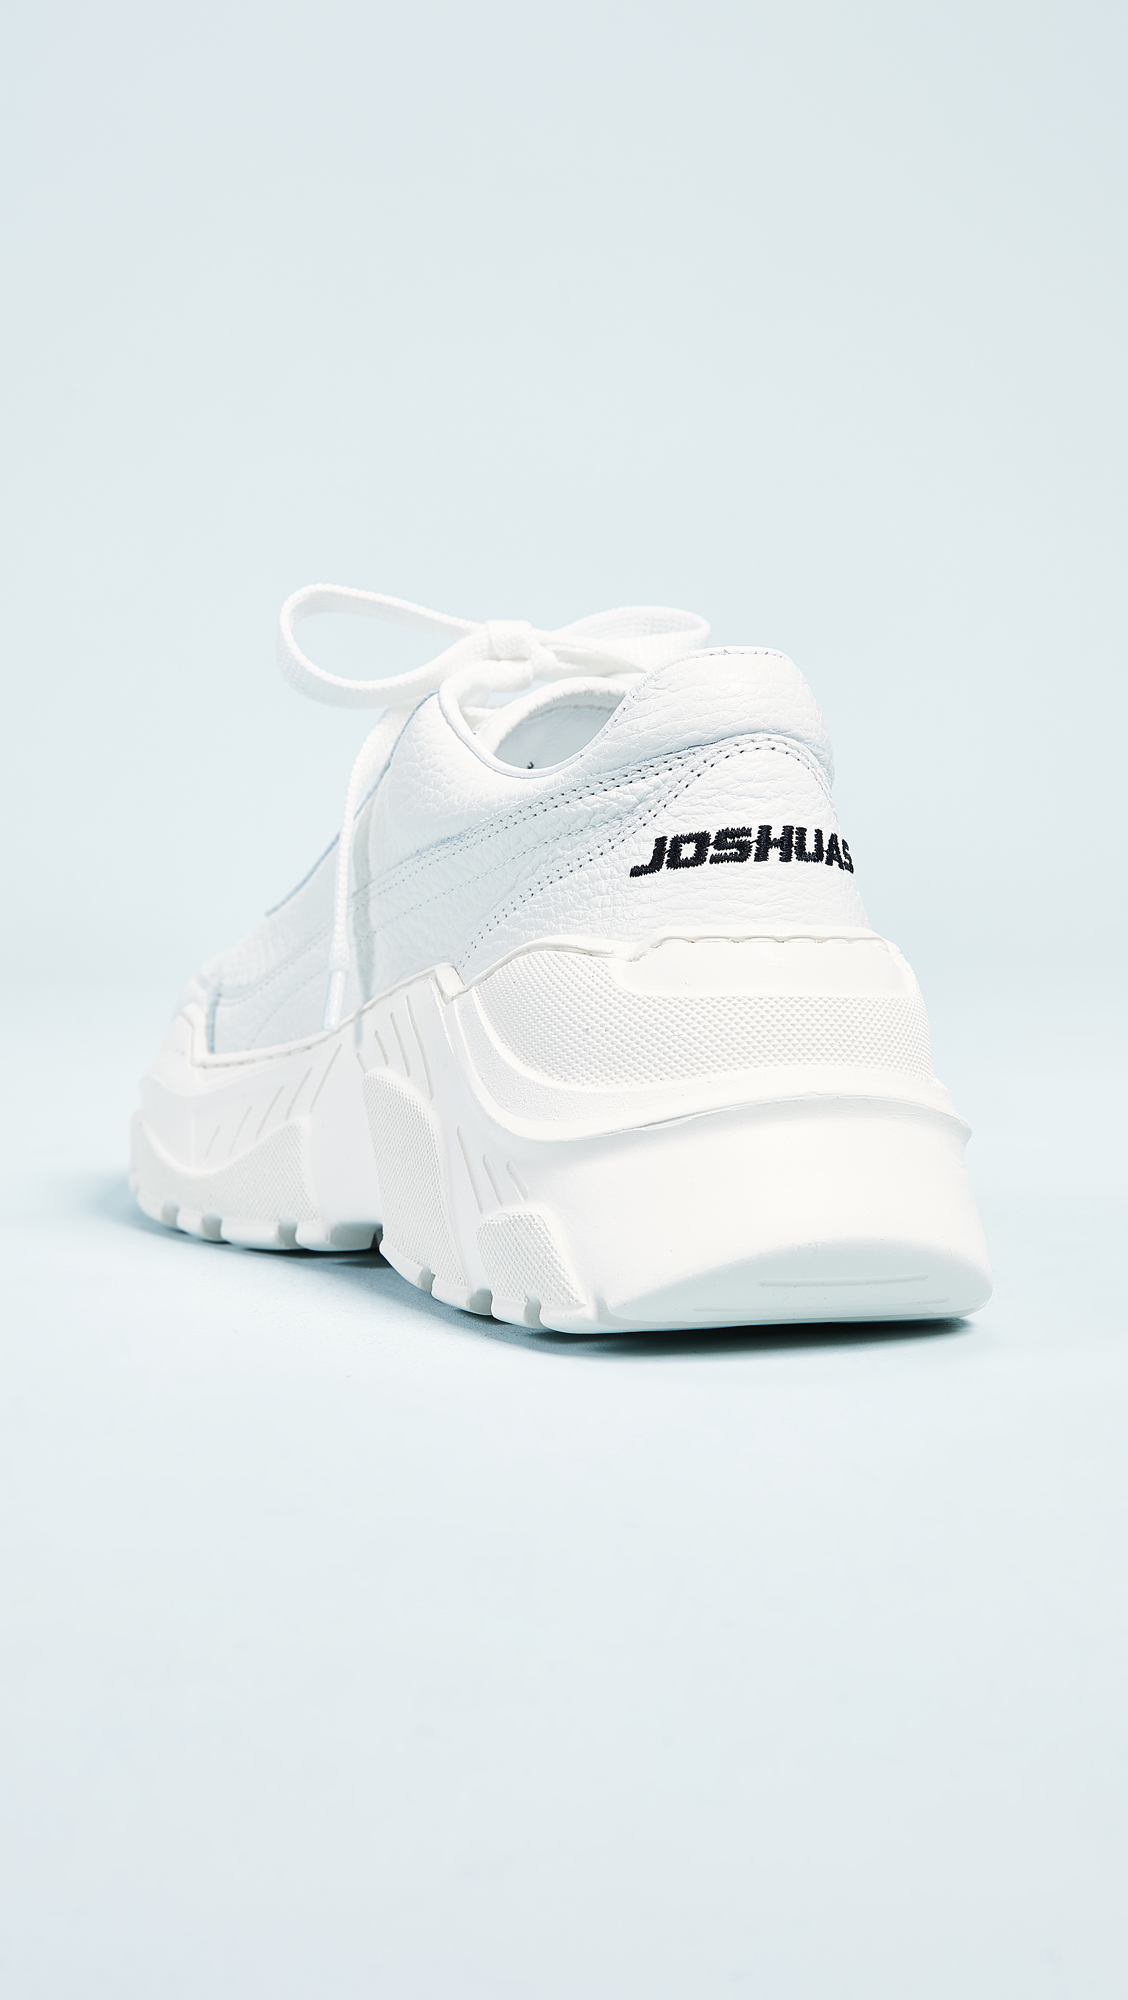 b6223cae95a43 Joshua Sanders Zenith Lace Up Sneakers